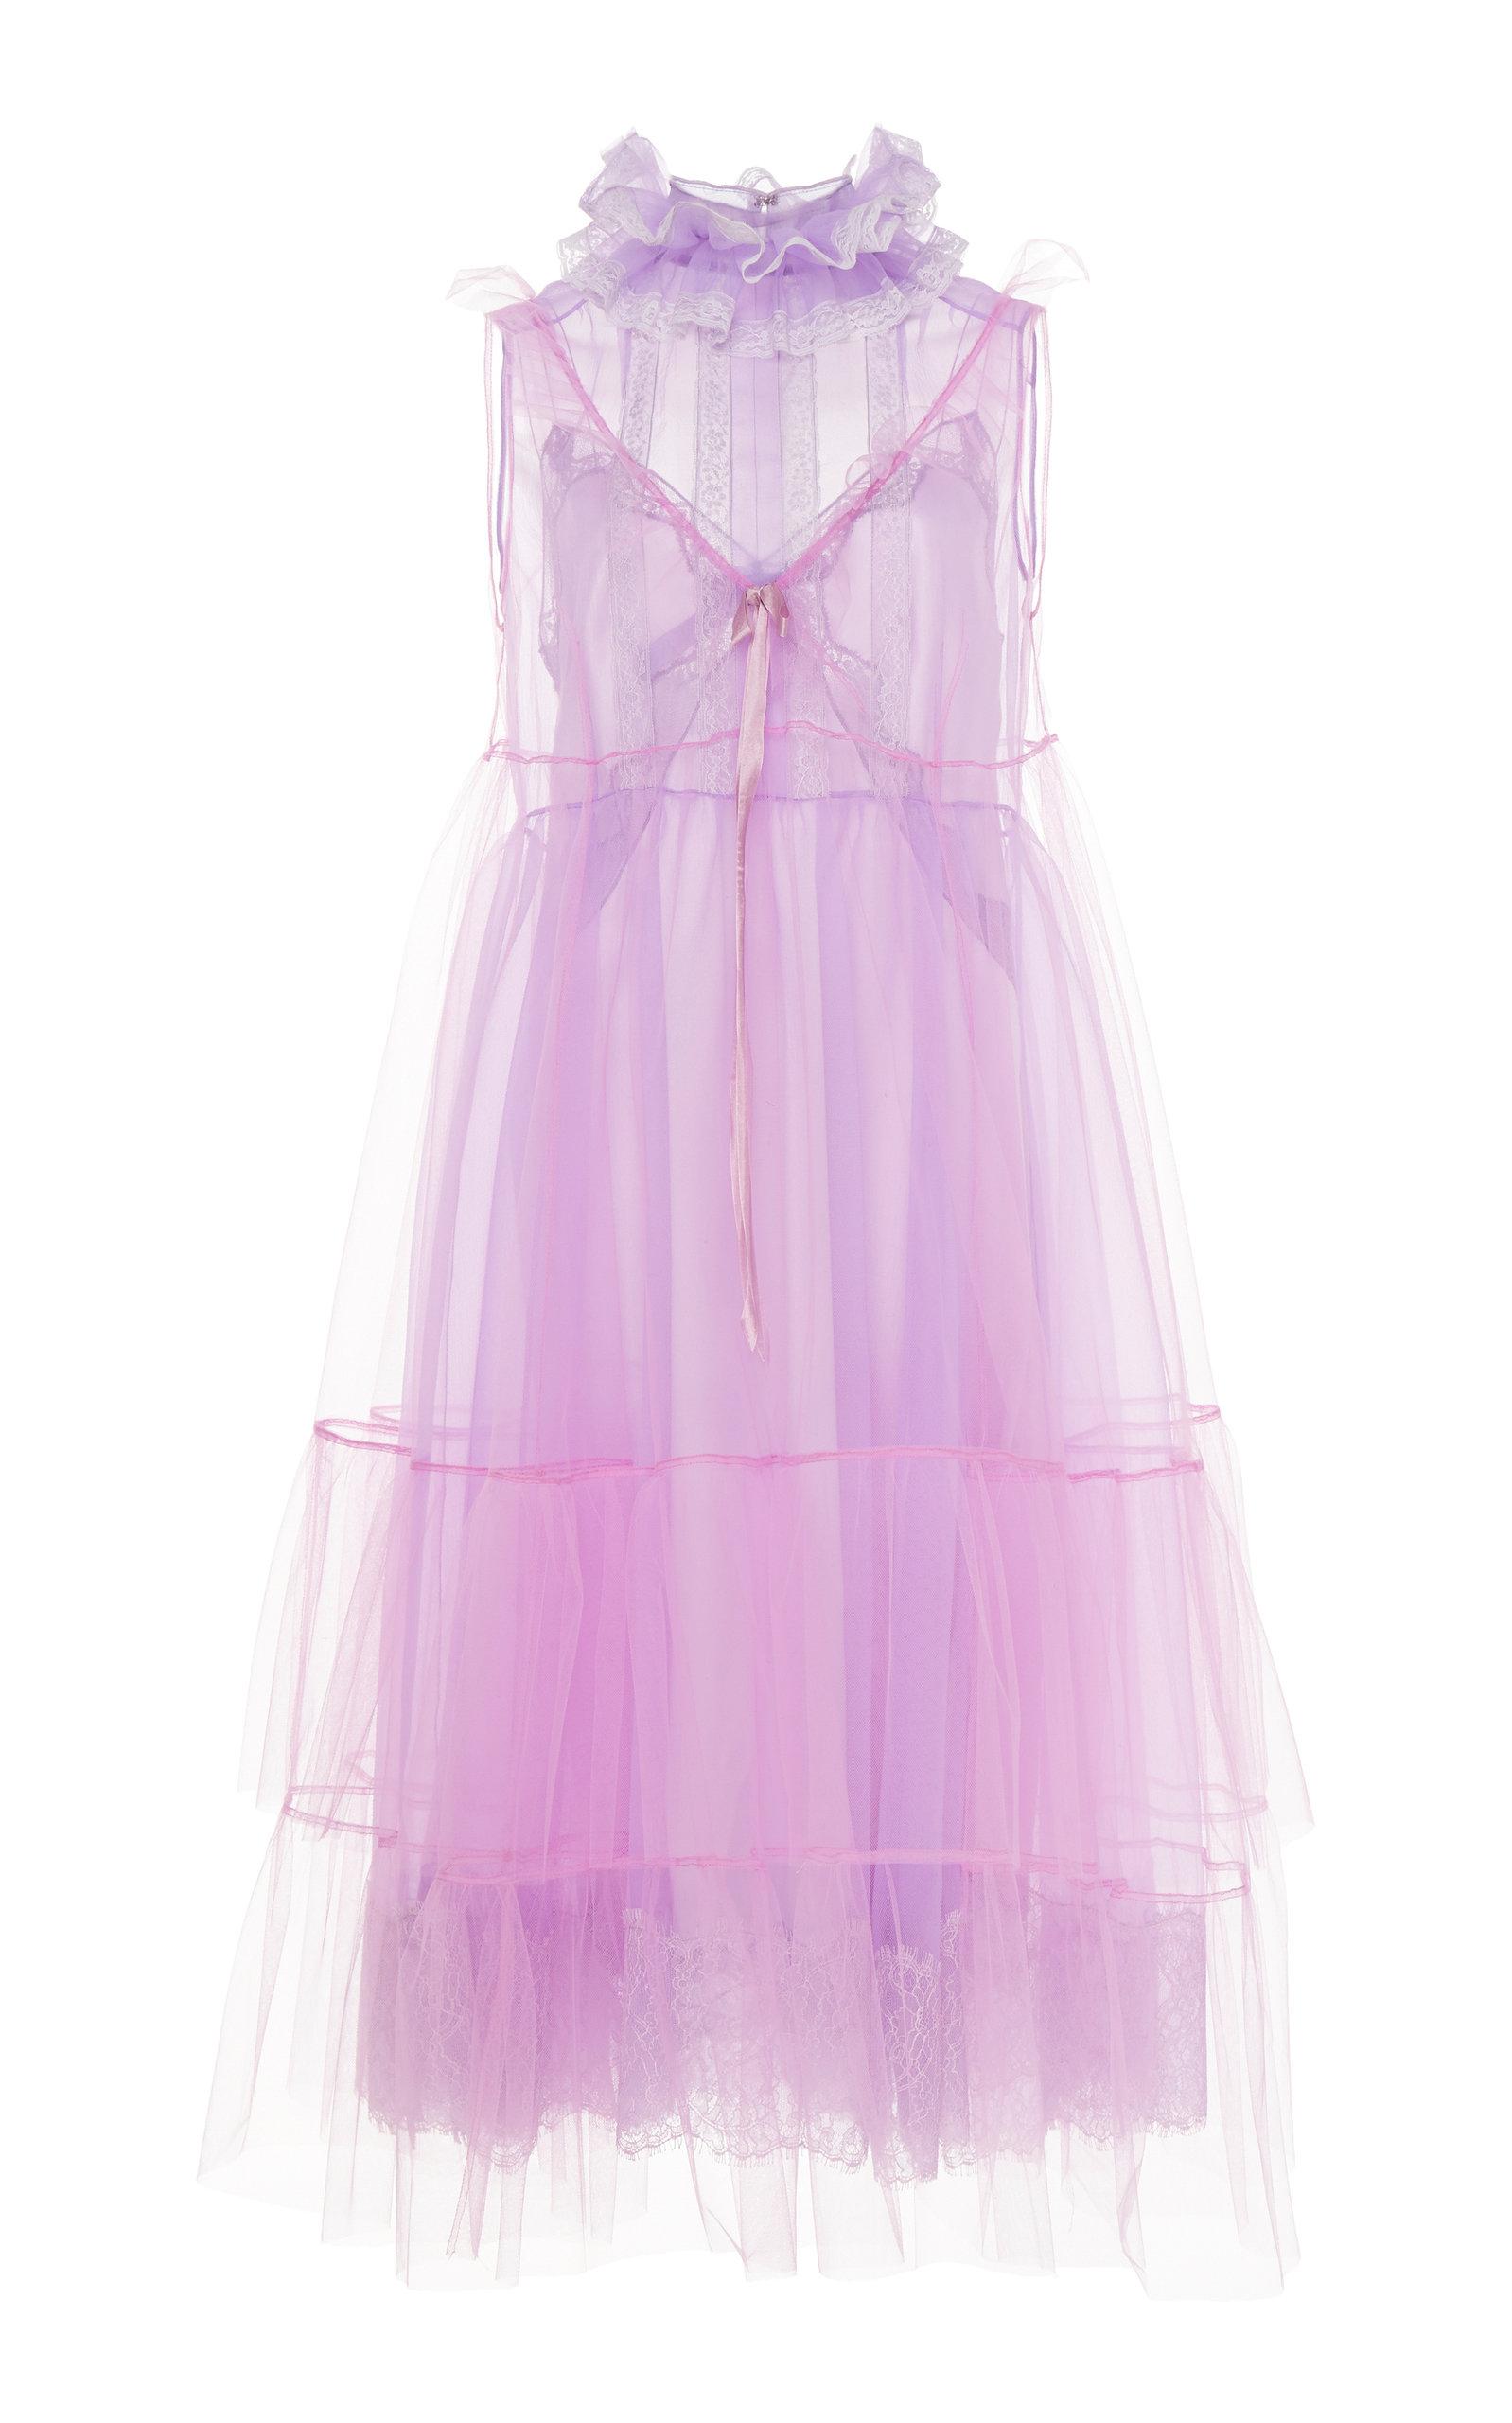 34c3c68d46 Marc JacobsCrinkled Semi-Sheer Organza Dress. CLOSE. Loading